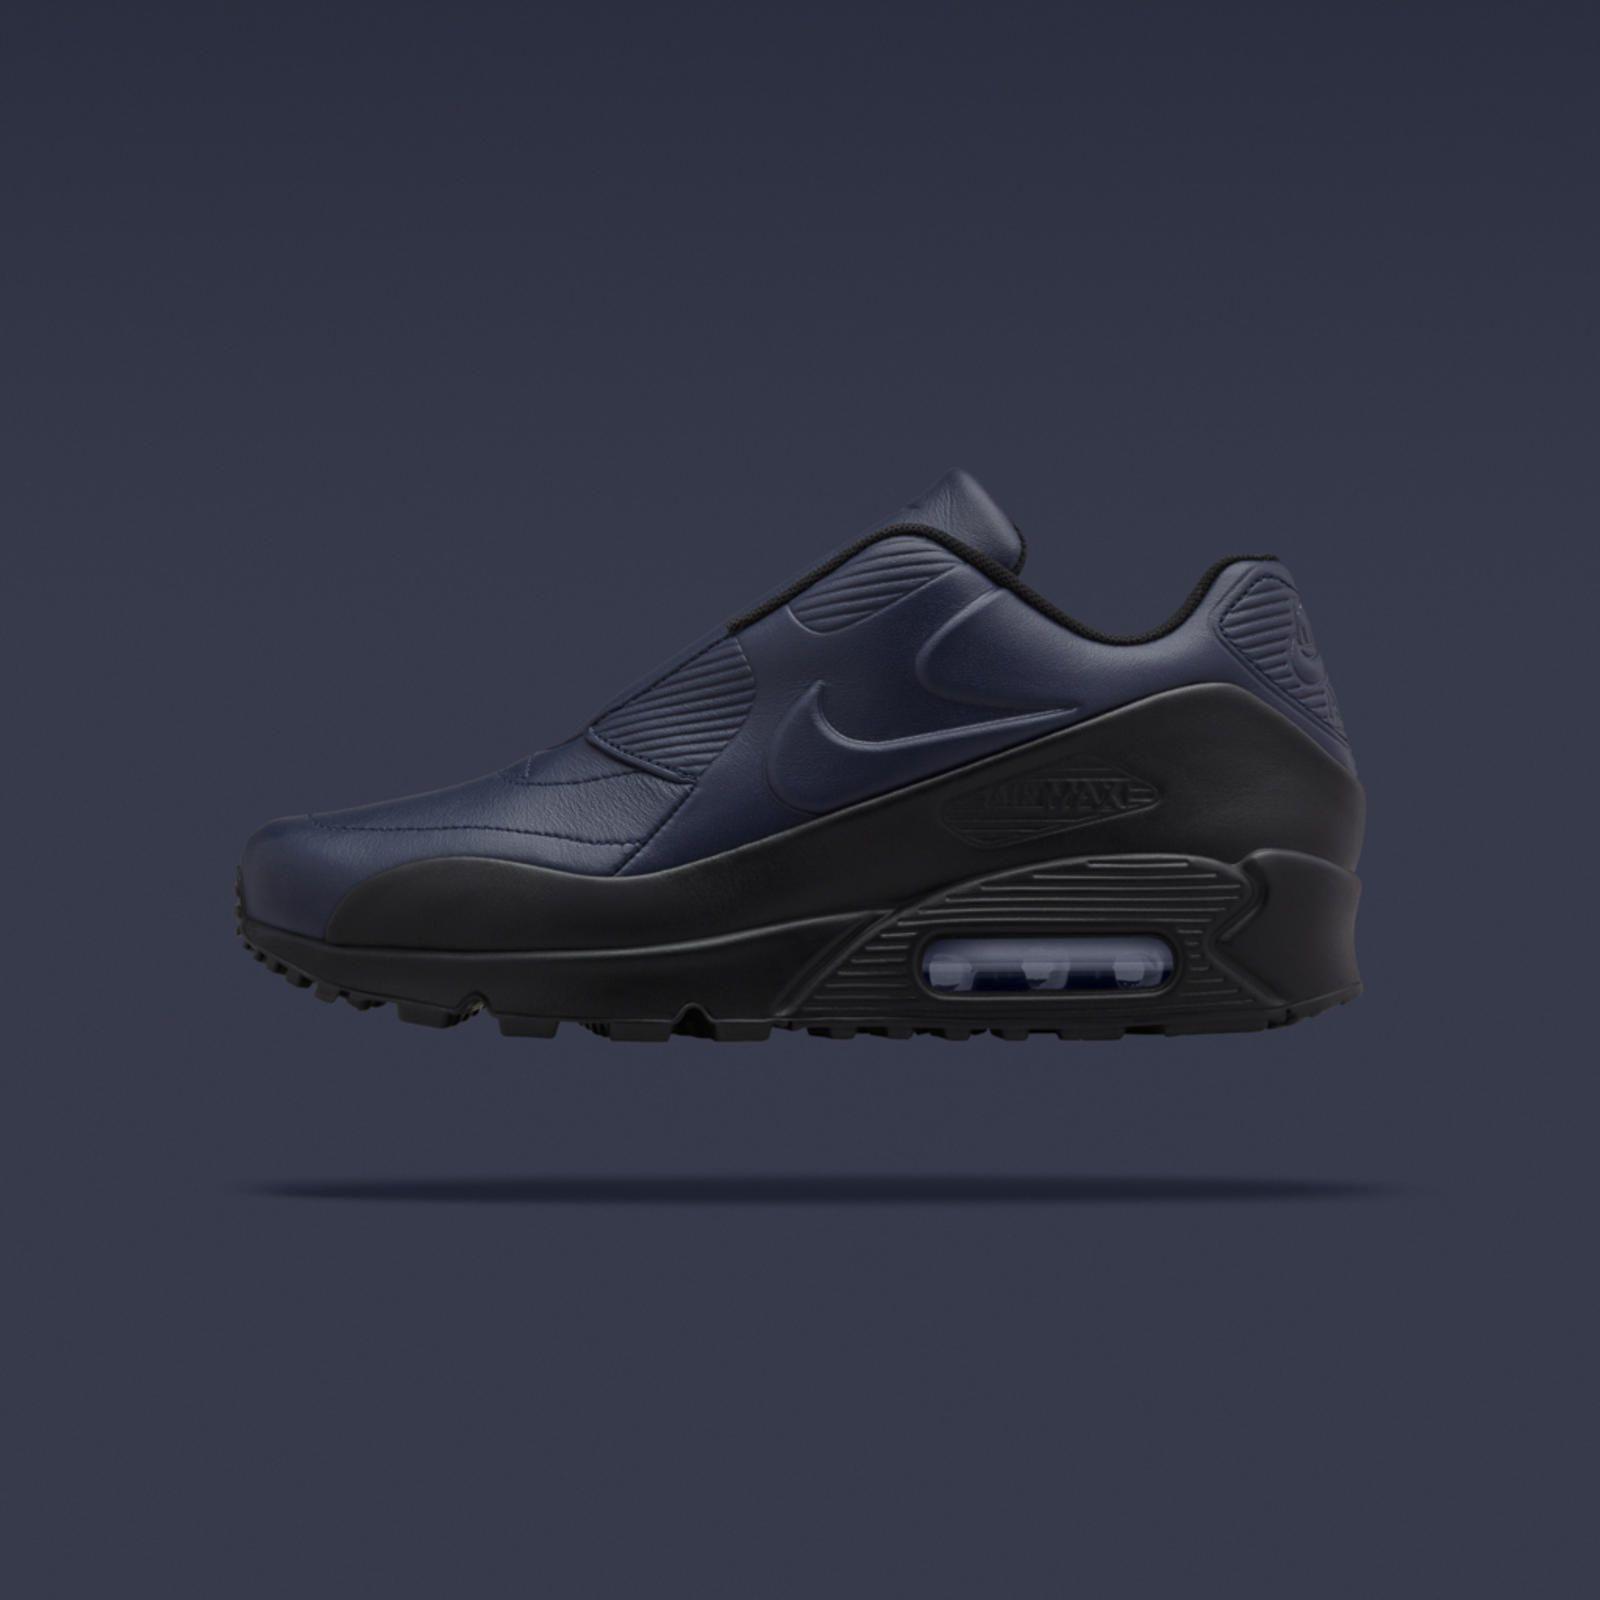 Nike News - NikeLab x sacai Brings a Feminine Edge to Sport Classics